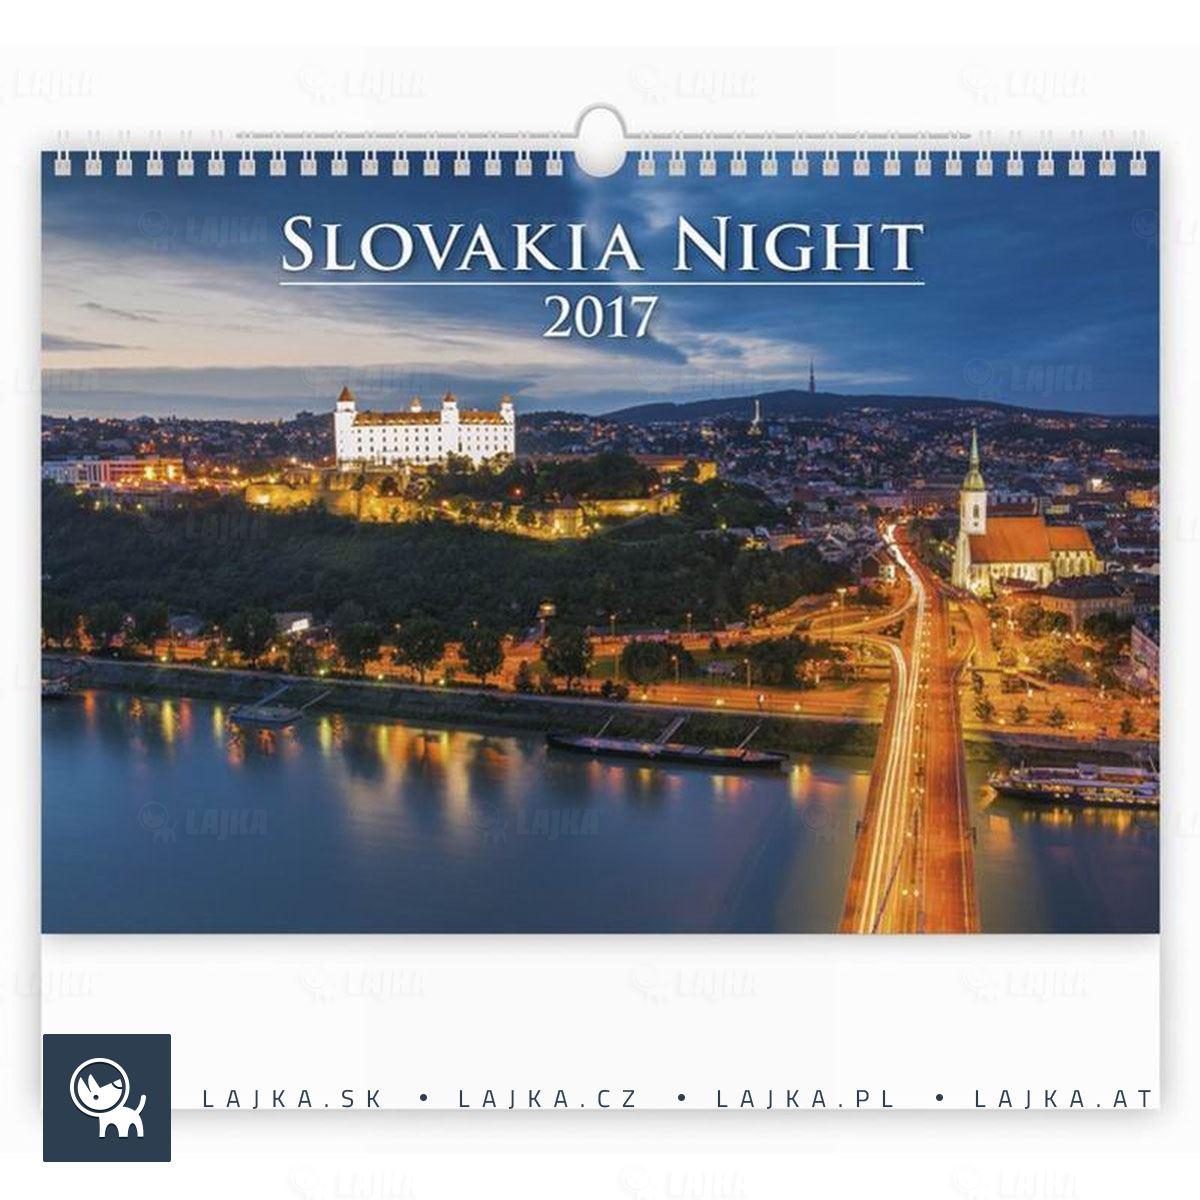 kalendar slovensko Kalendár Slovensko v noci 2017 | Reklamné Predmety kalendar slovensko